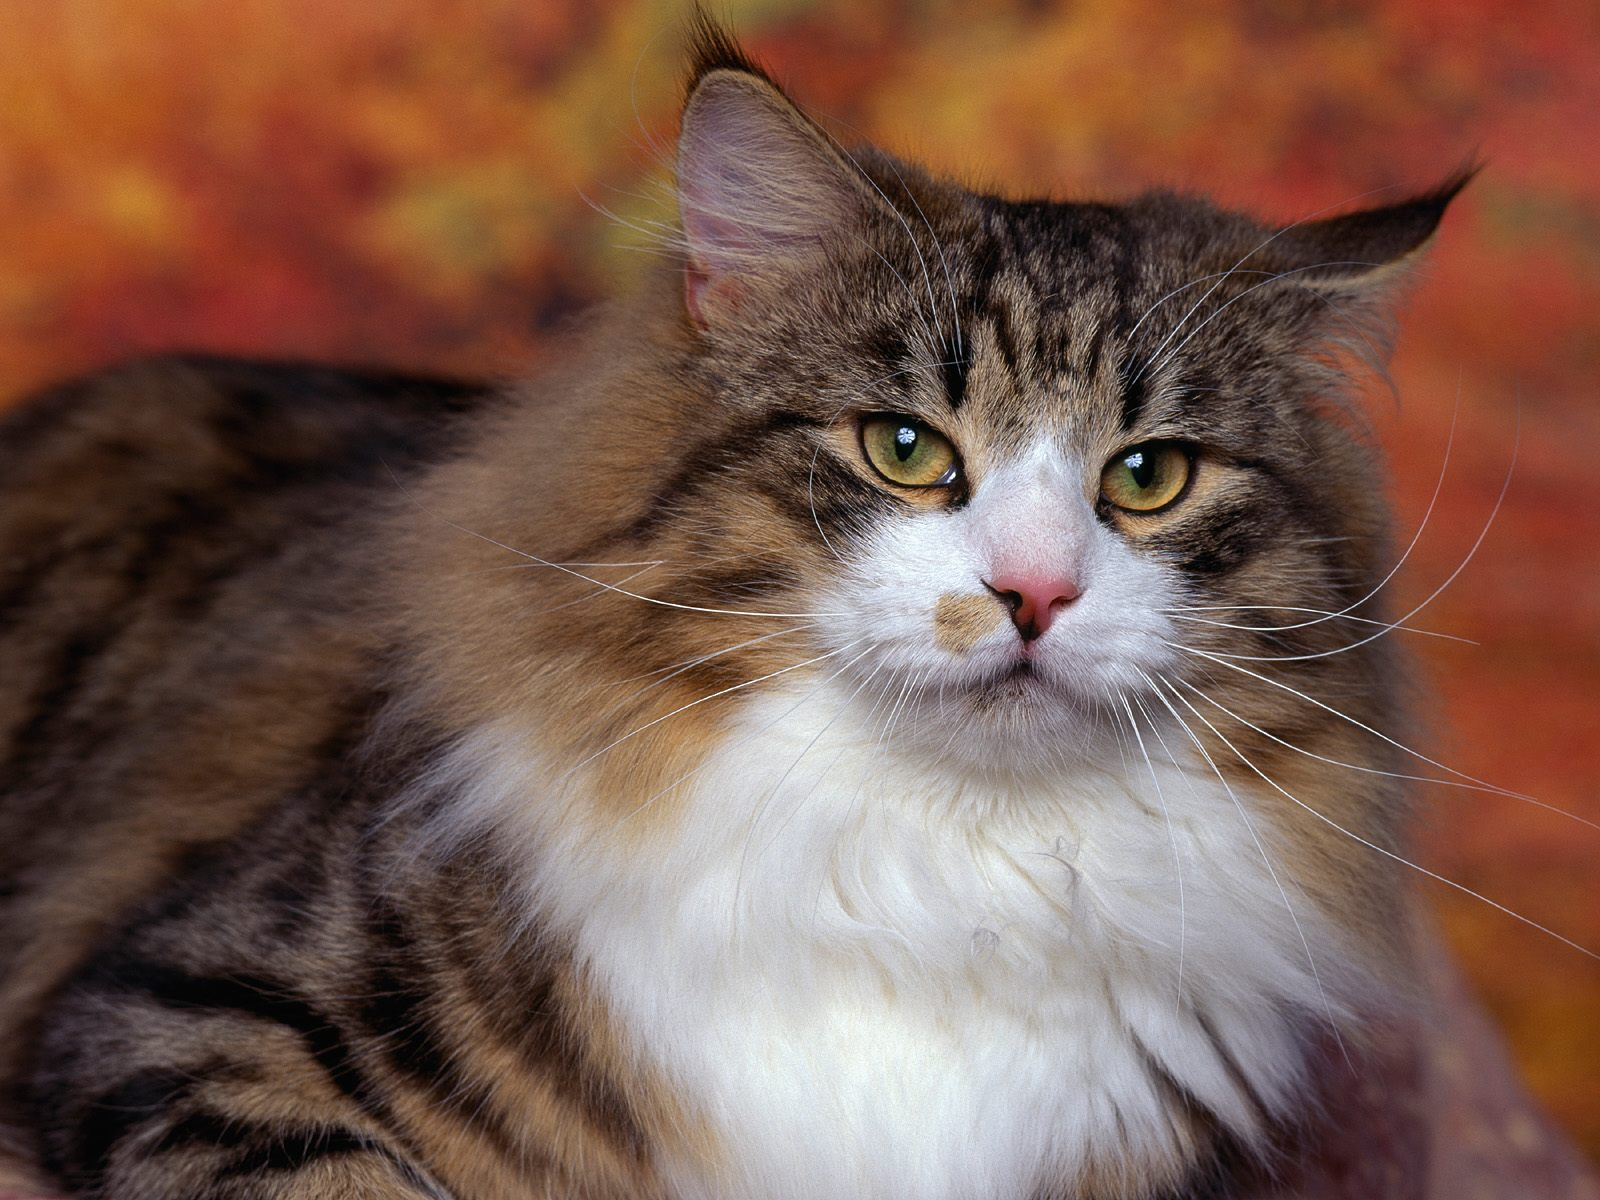 Cat Wallpaper Cute Cat Pictures Animal Desktop Backgrounds 1600x1200